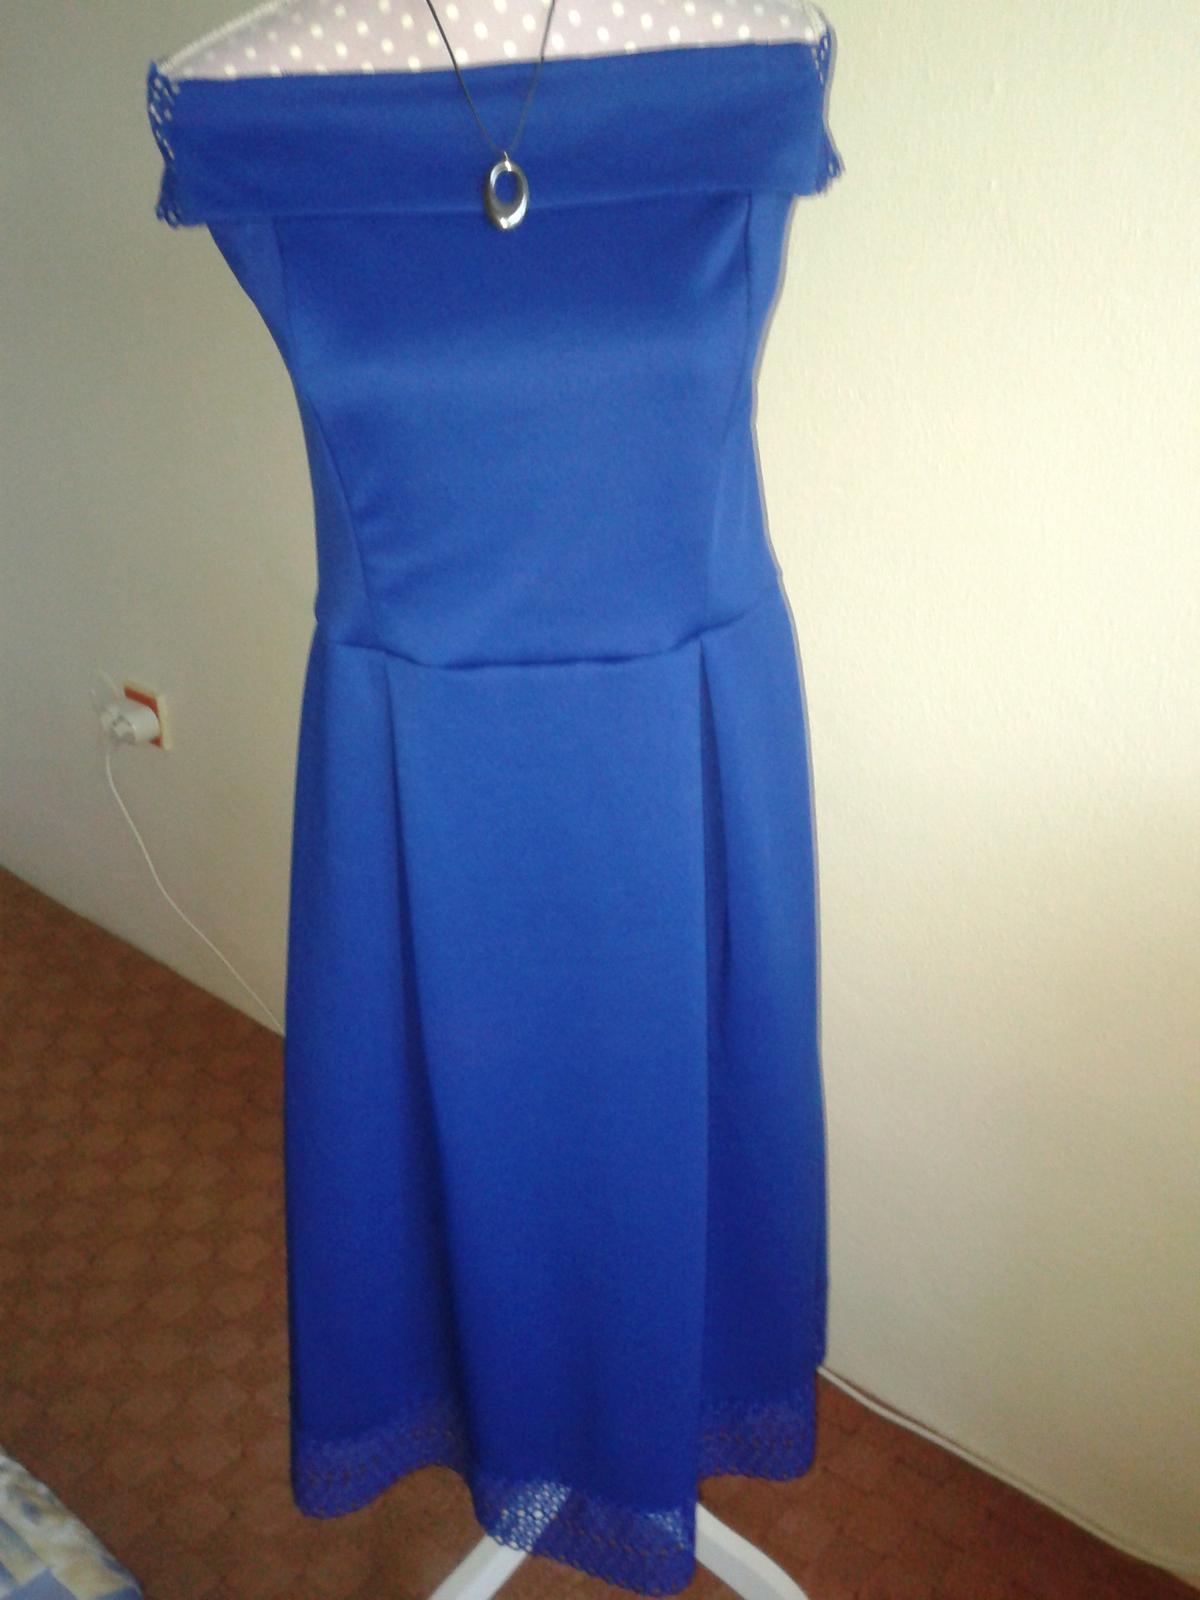 jasnomodré šaty cez ramená Dorothy Perkins veľ. L/42 - Obrázok č. 4